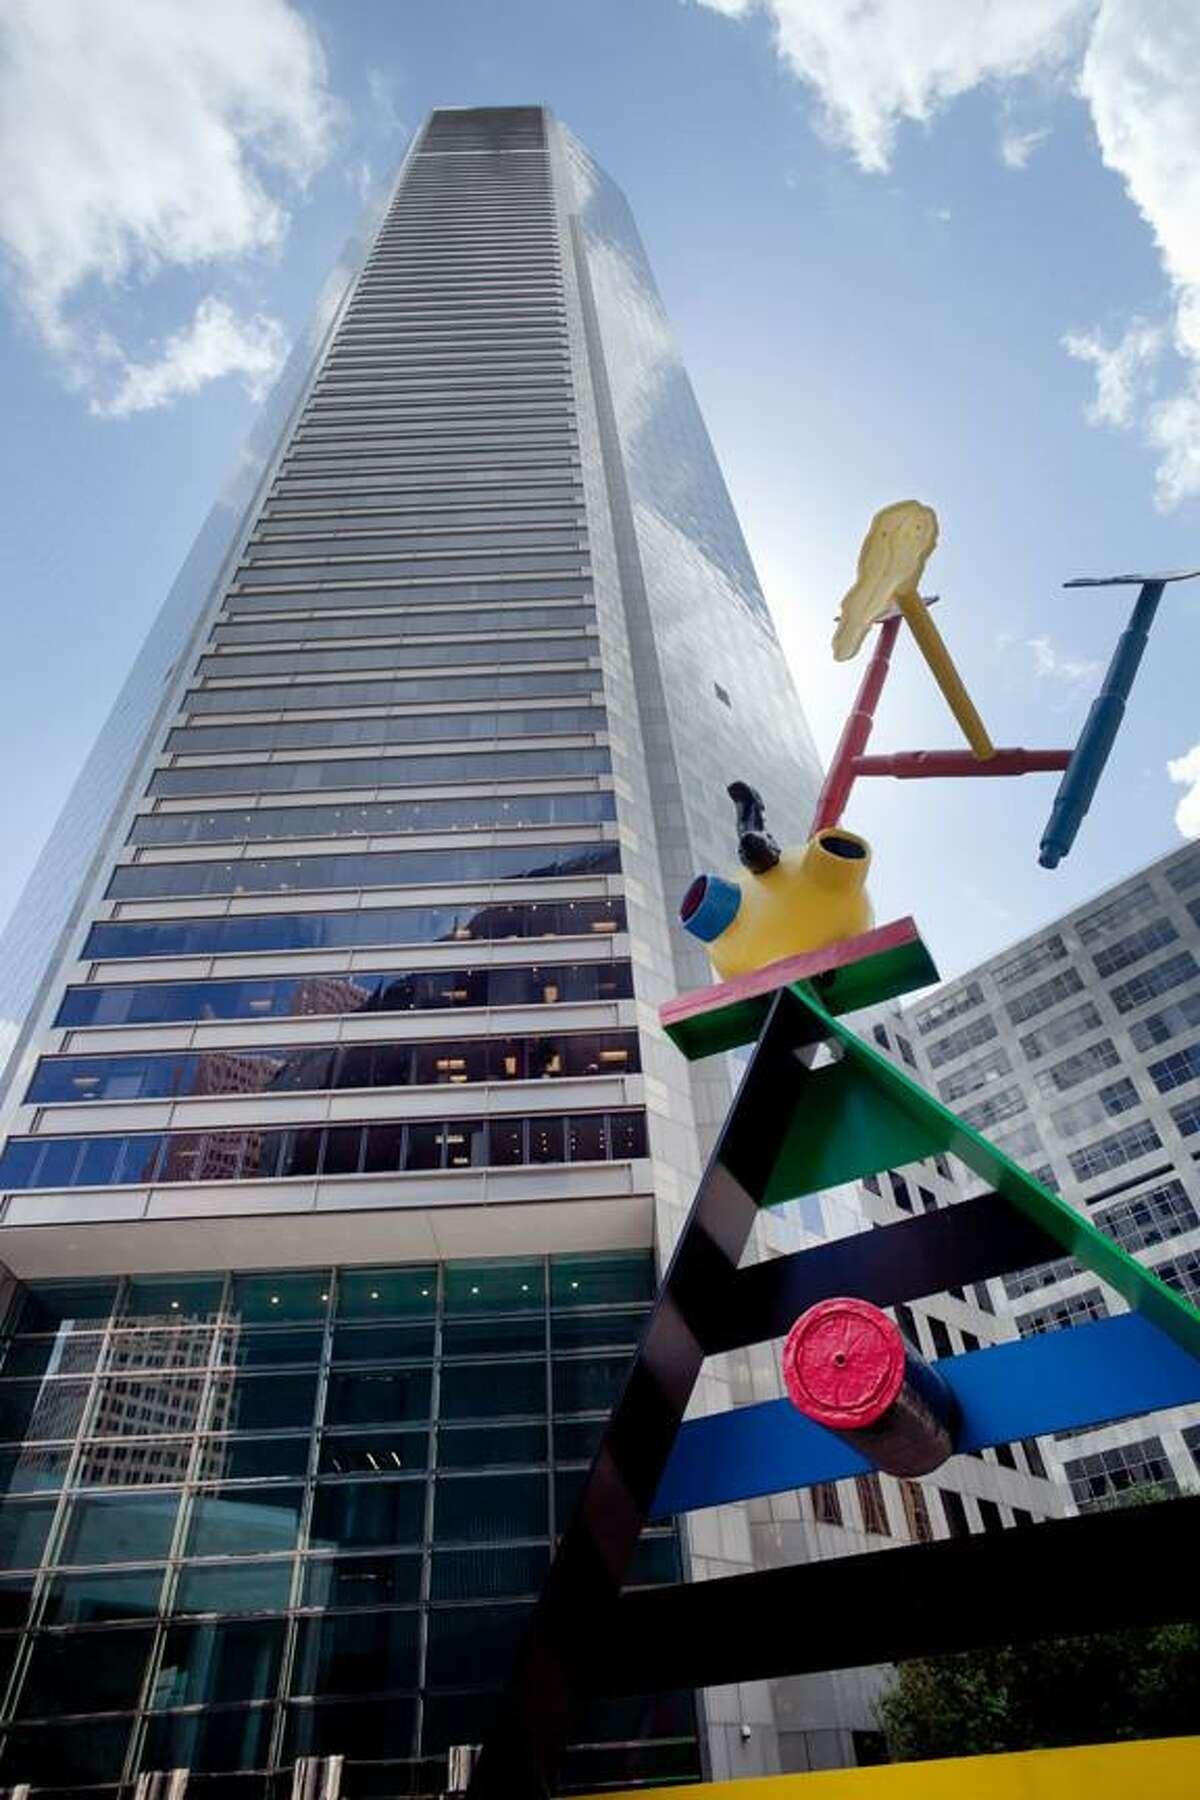 The Joan Miró sculpture title